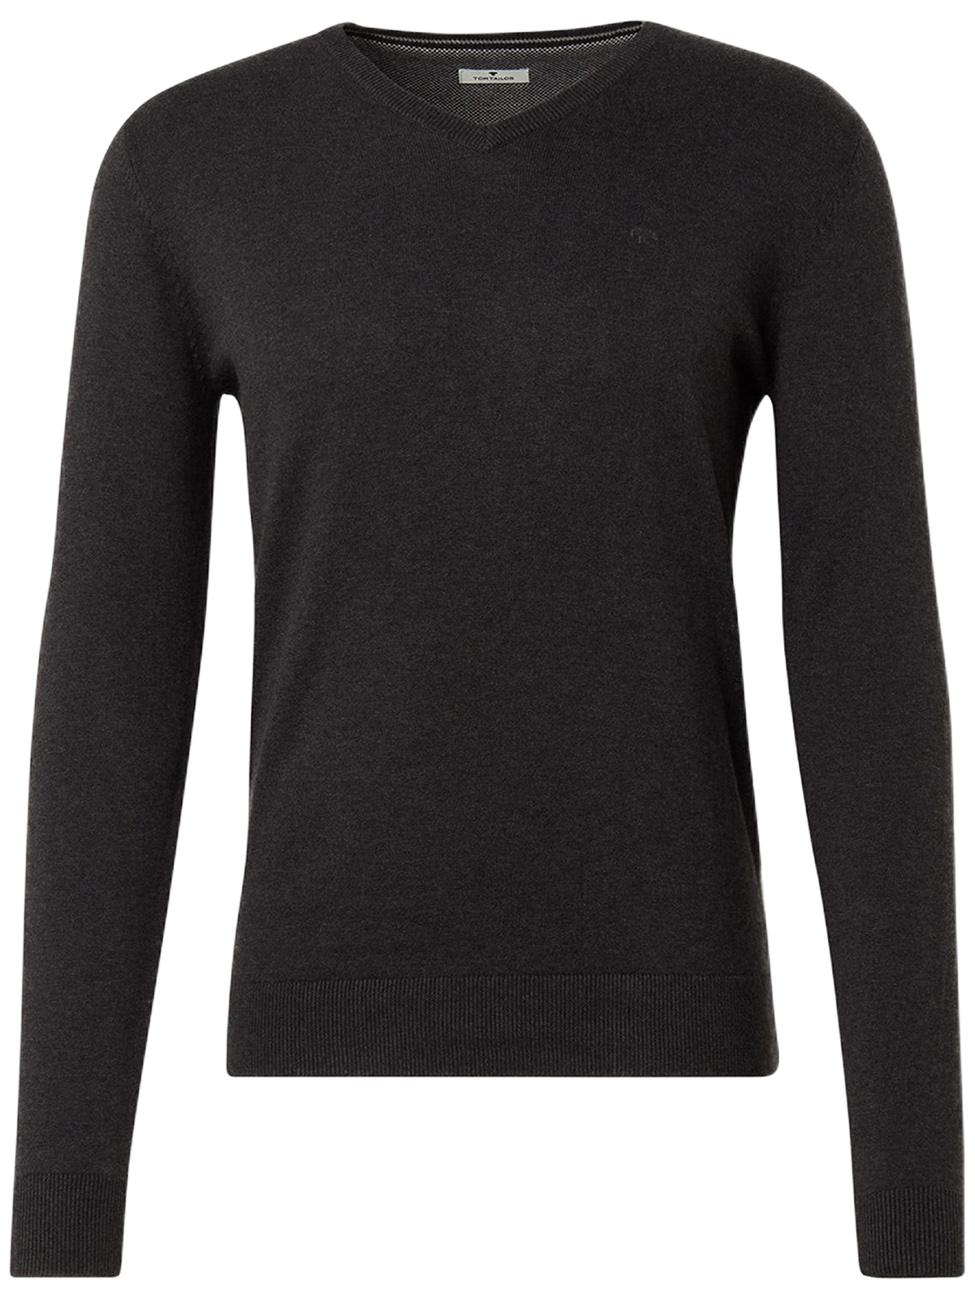 tom-tailor-herren-v-neck-strickpullover-melange-basic-regular-fit